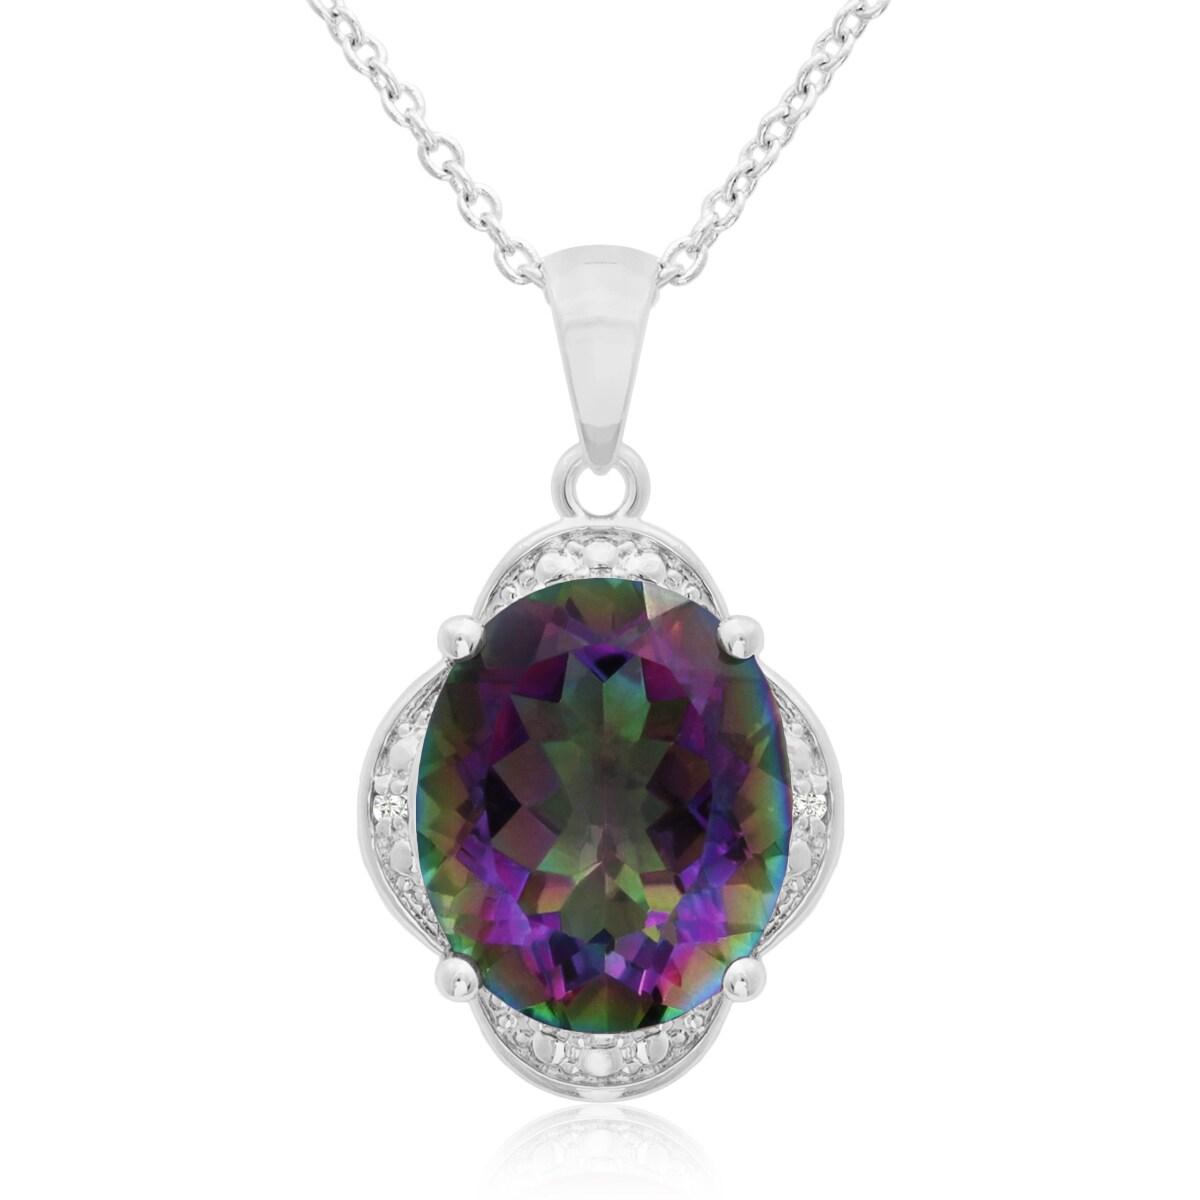 4 3/4 TGW Mystic Topaz And Diamond Necklace, 18 Inches (M...